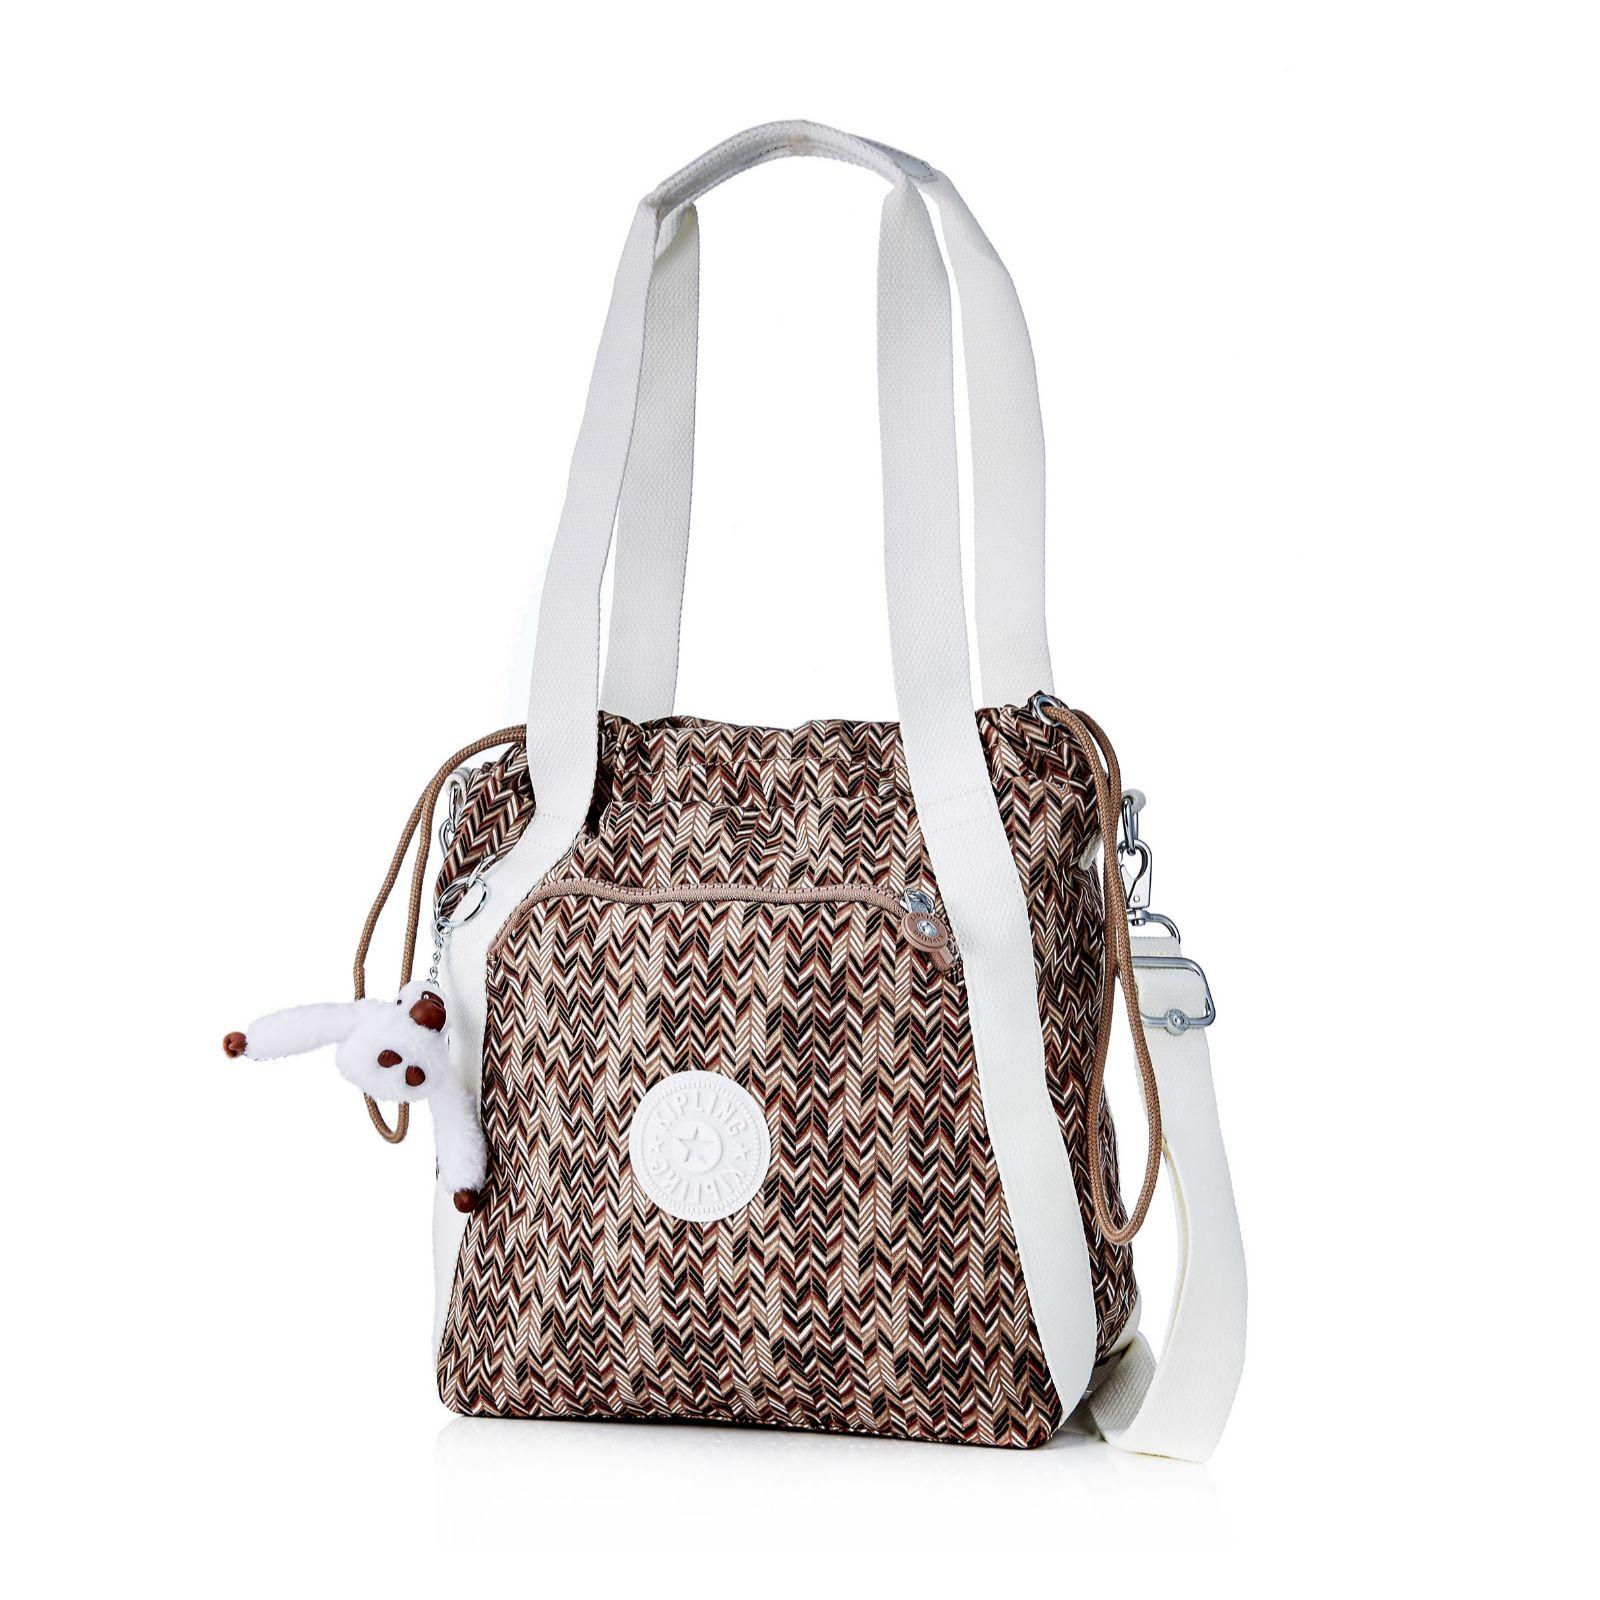 Kipling Nillad Large Shoulder Bag - QVC UK fc9015912e381